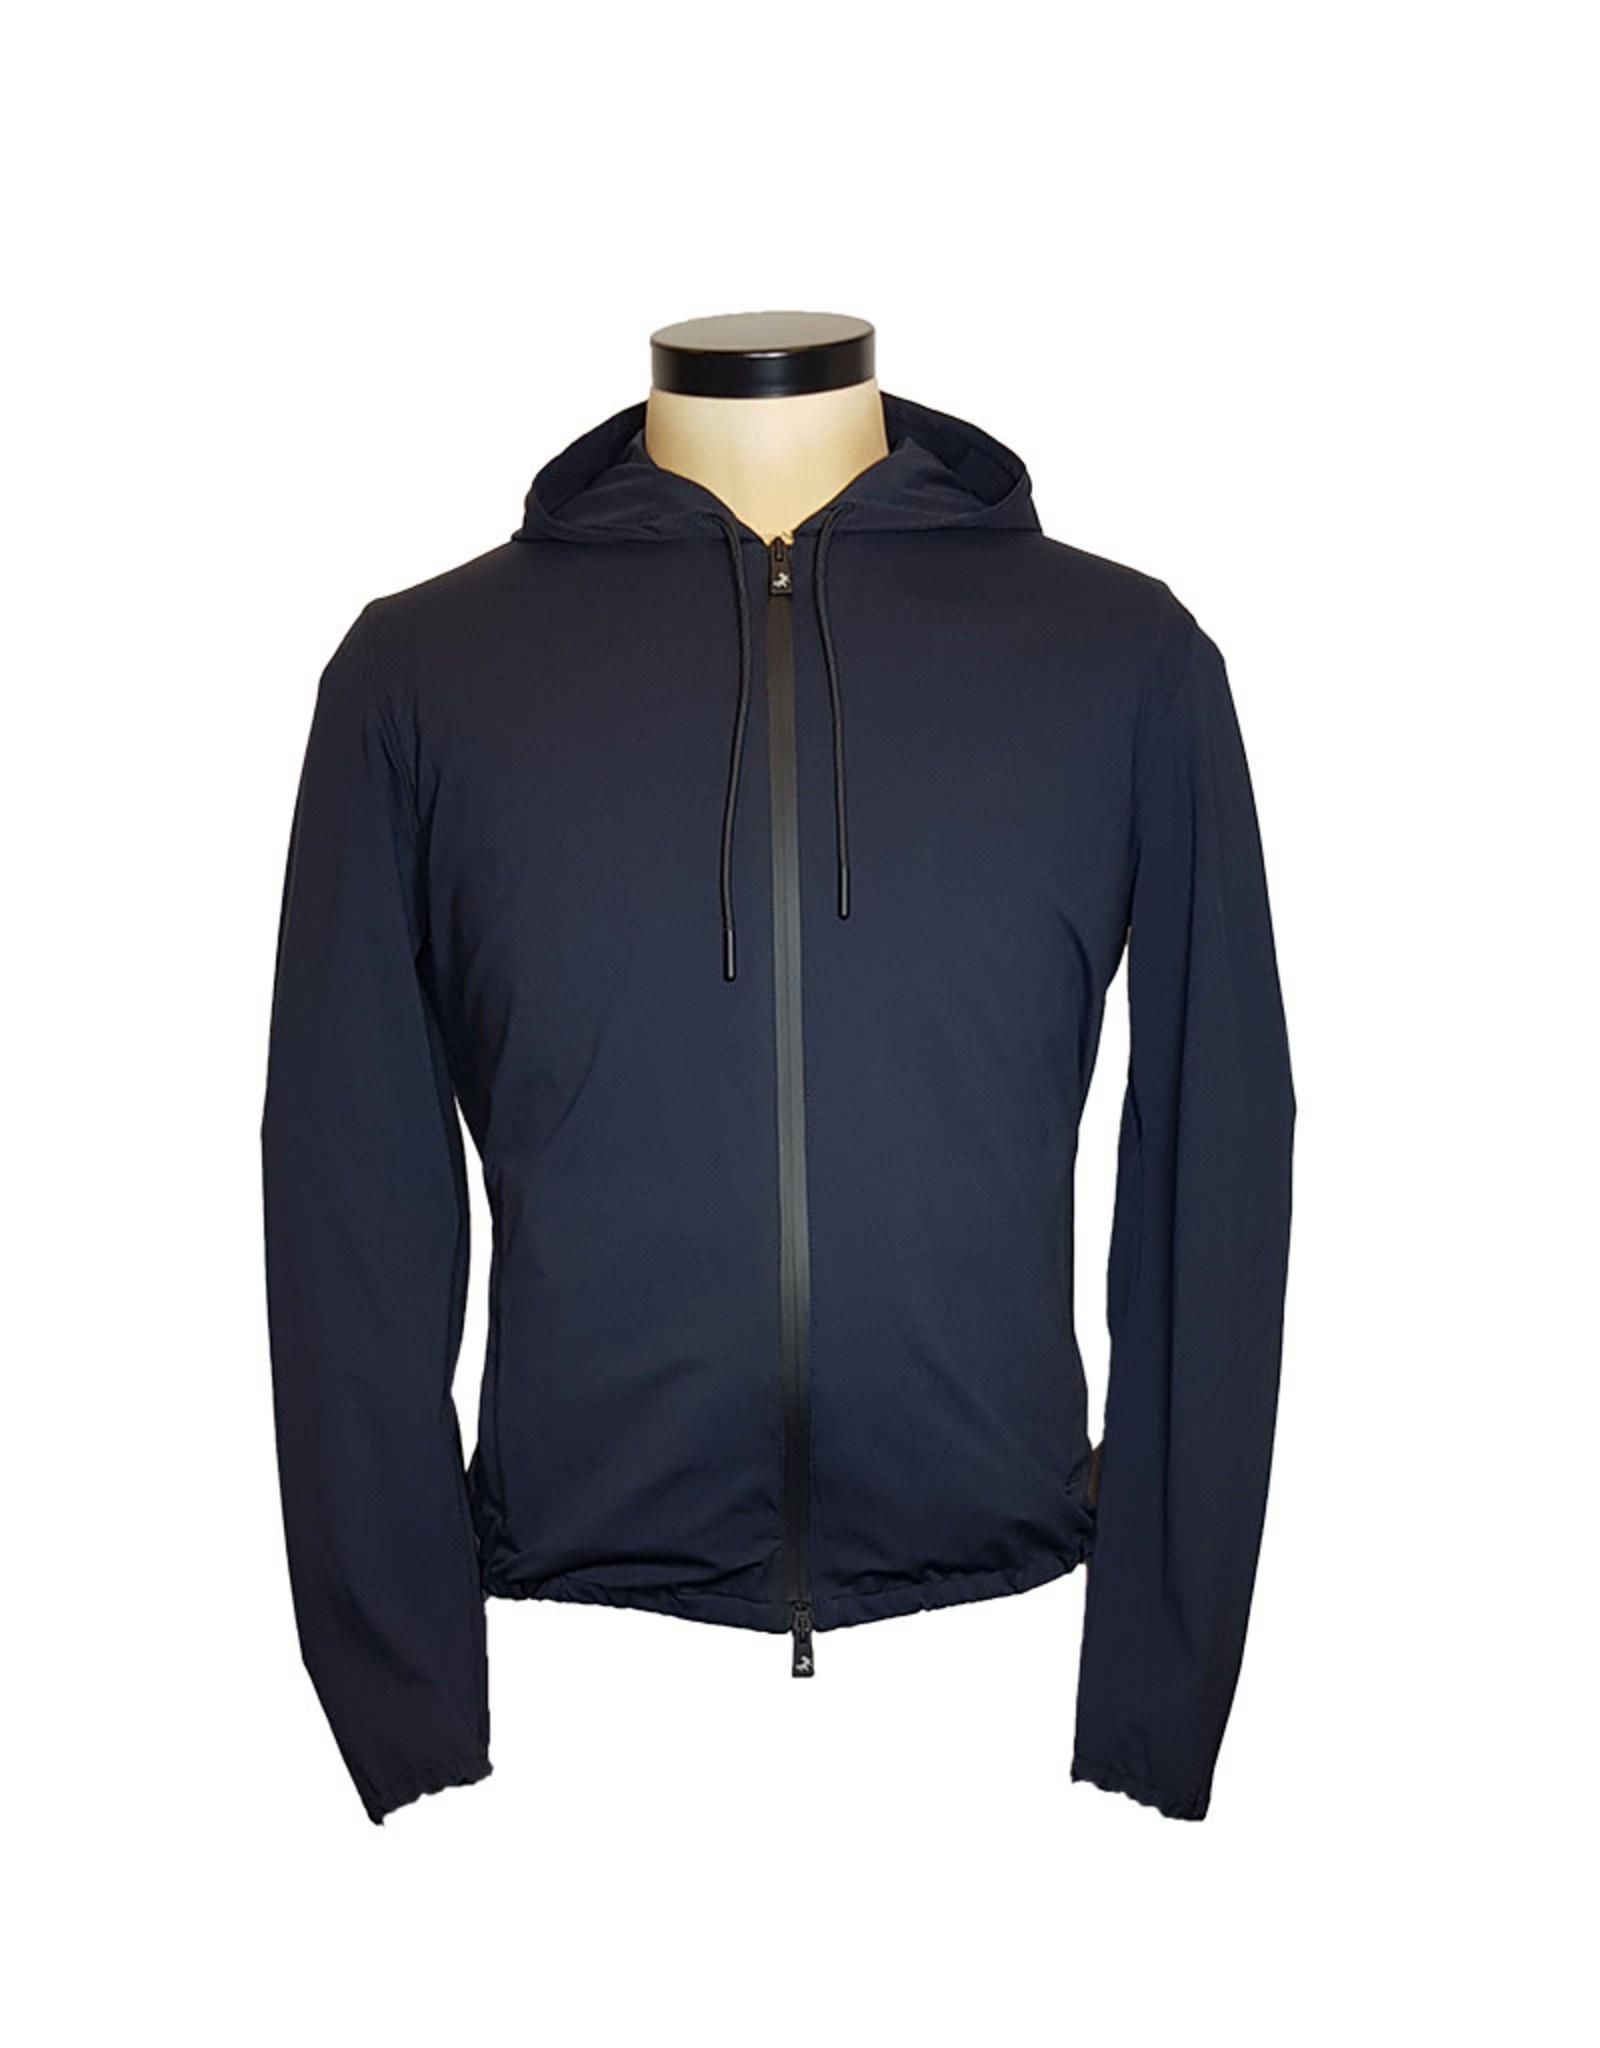 Tombolini Tombolini hoodie blauw EYAP U780